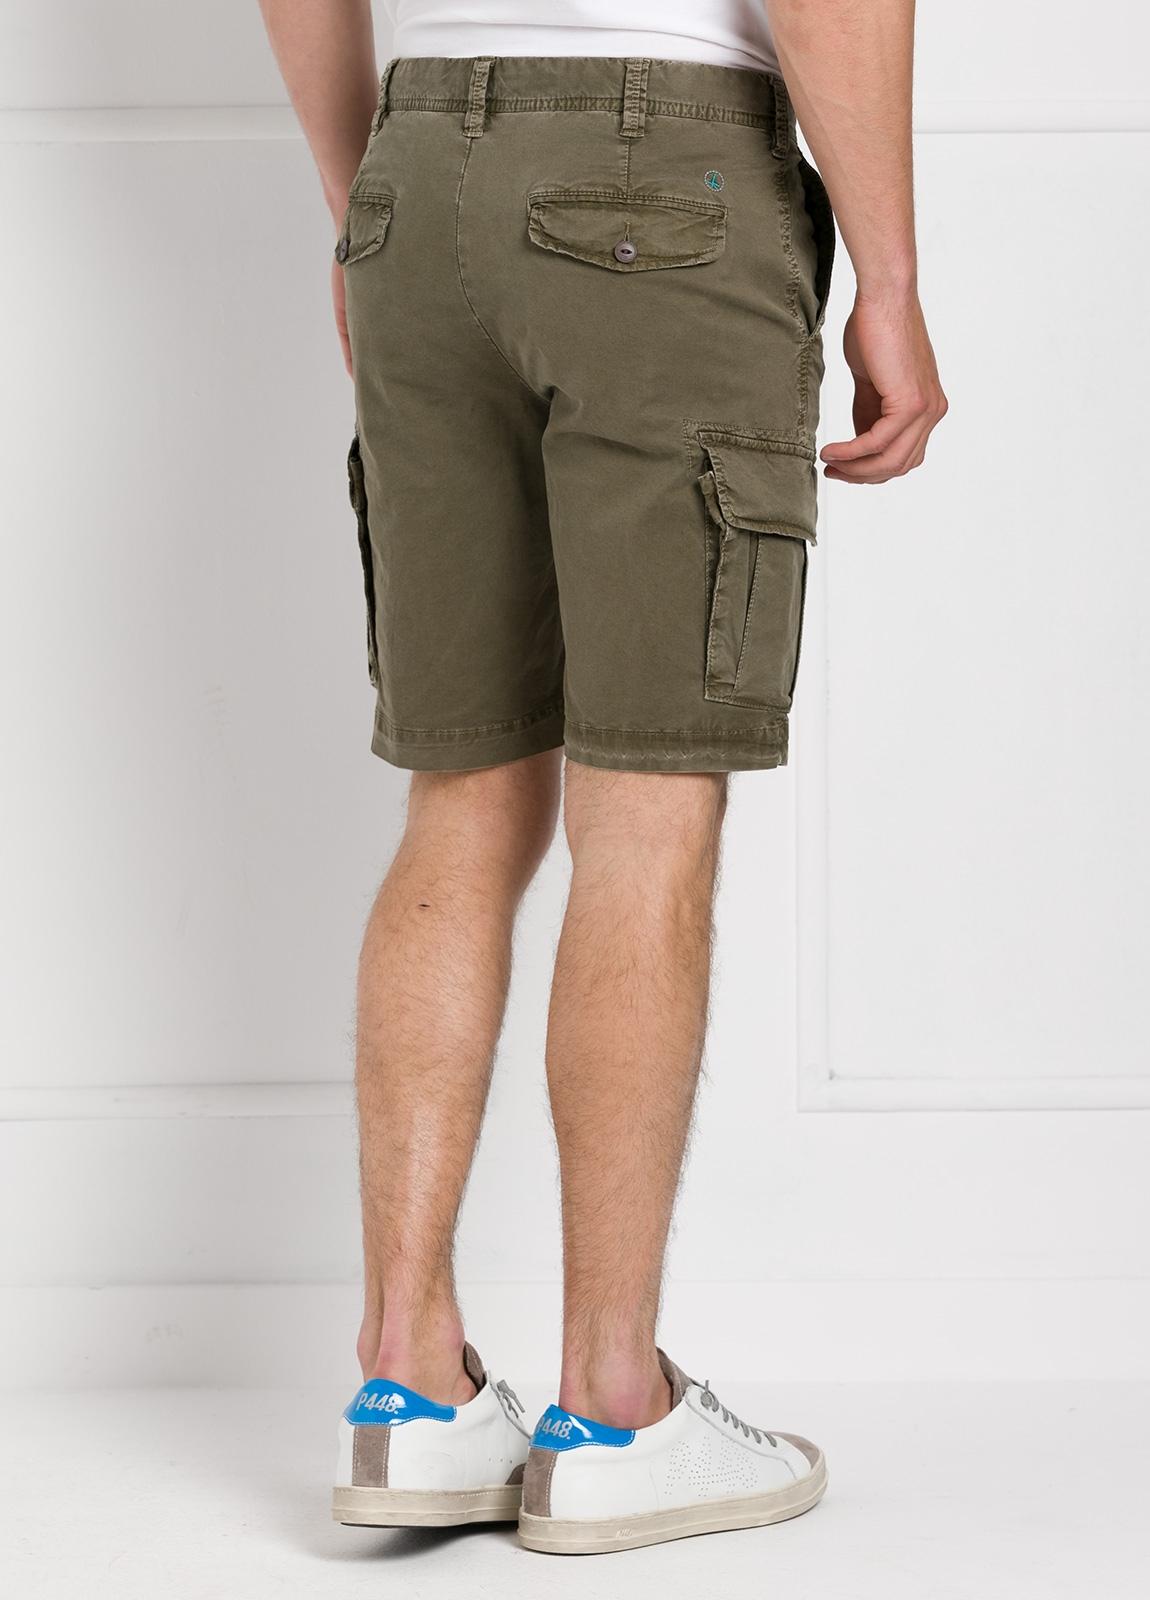 Bermuda modelo BILL 334 slim fit con bolsillos laterales color kaki. Algodón gabardina. - Ítem2